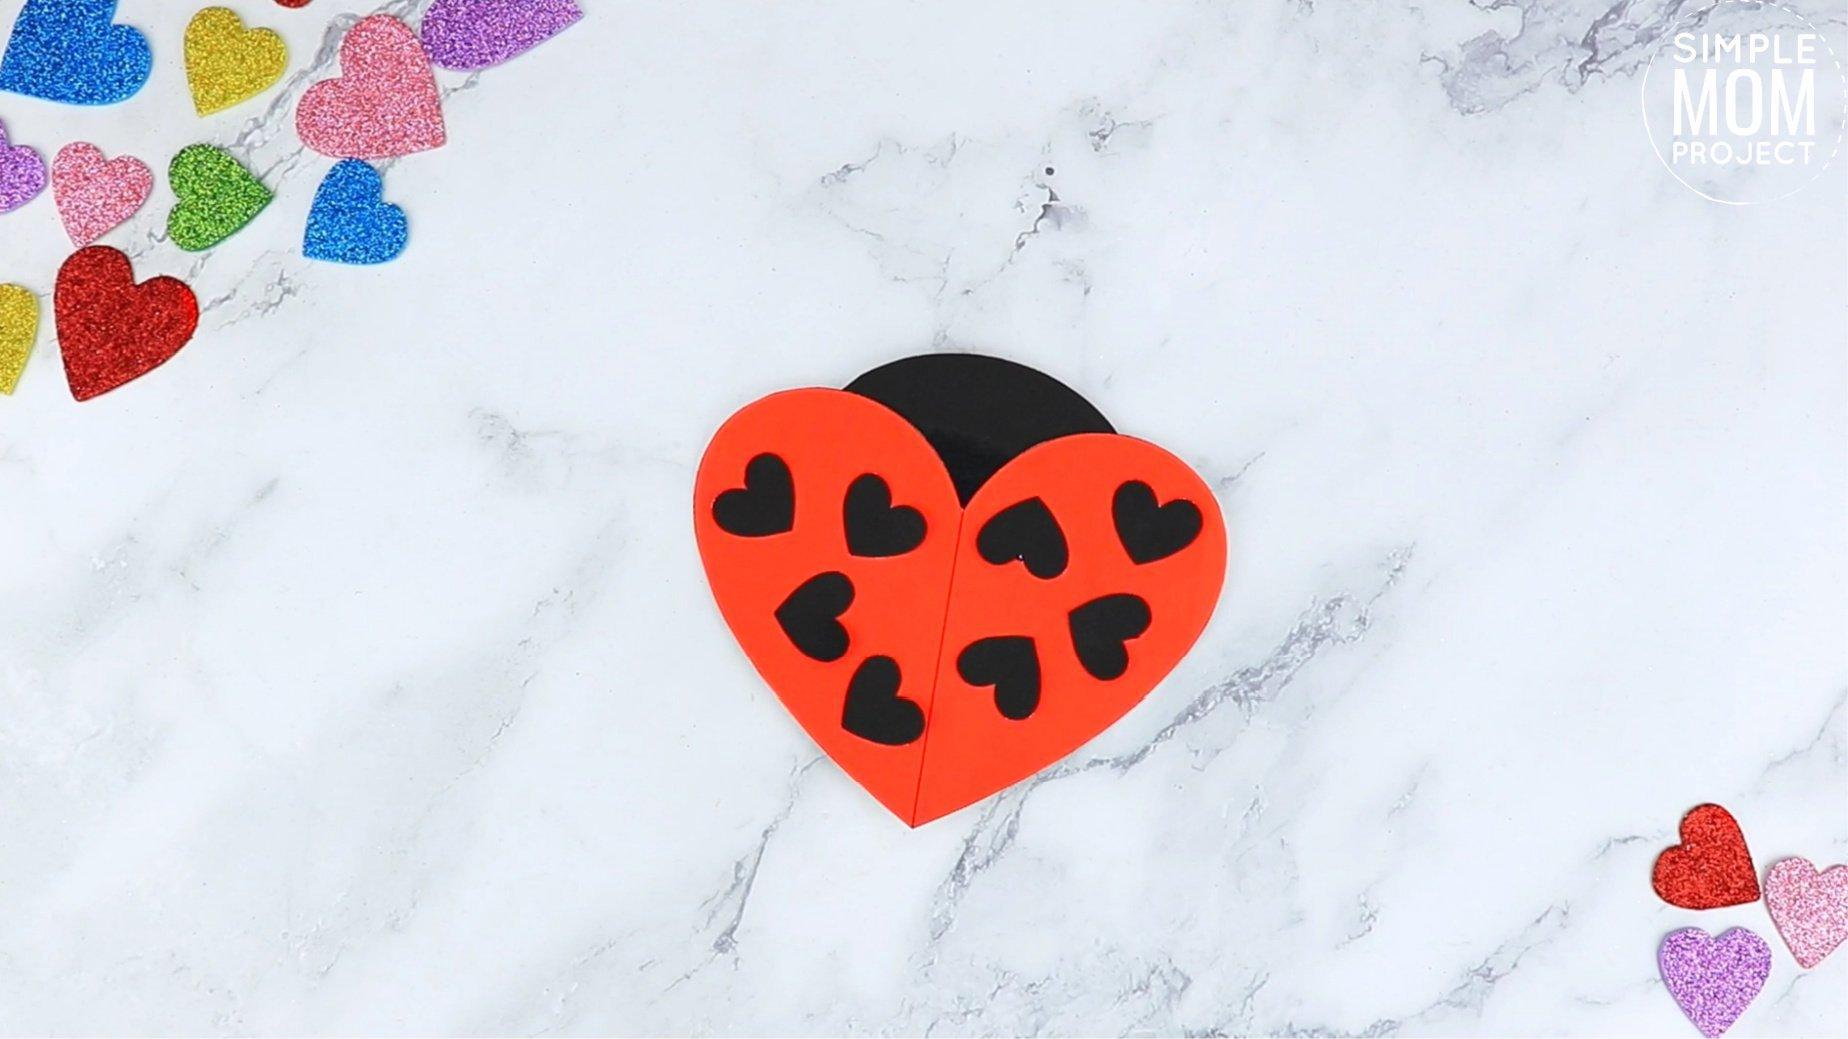 Easy Printable Diy Heart Lady Bug Craft for Preschool, toddler, kindergarten